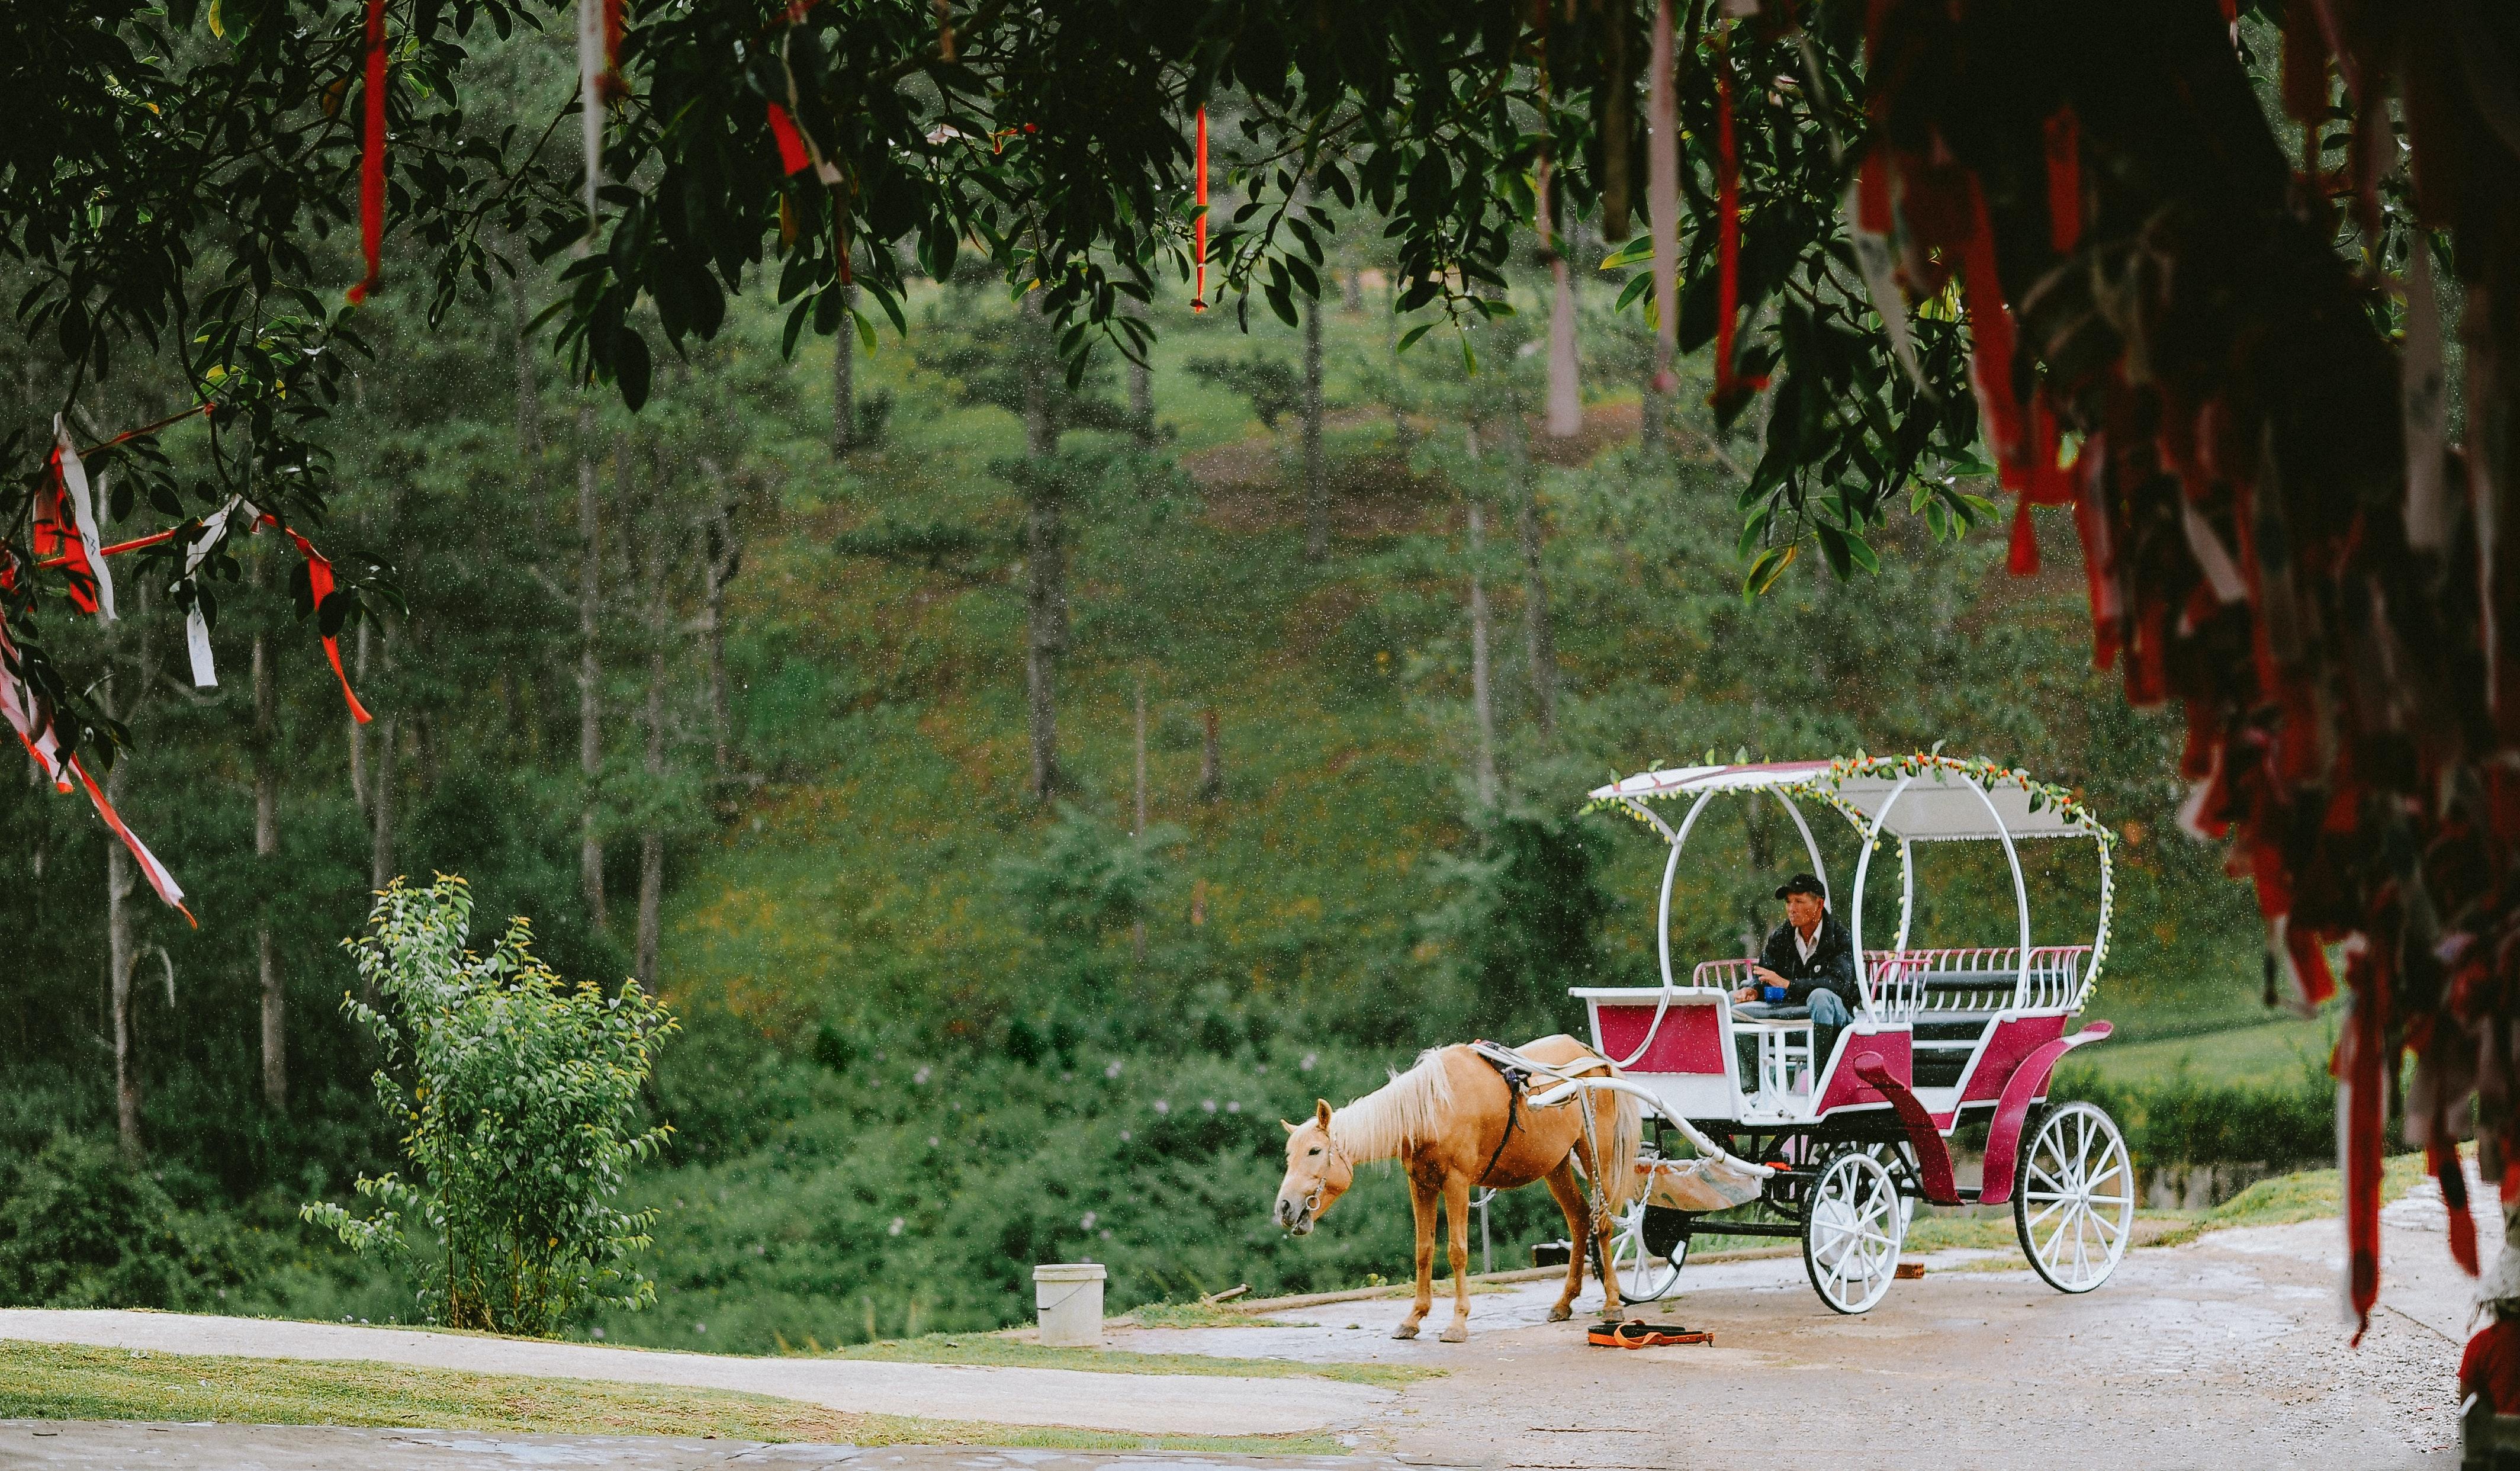 Entour On A Horse Carriage Ride